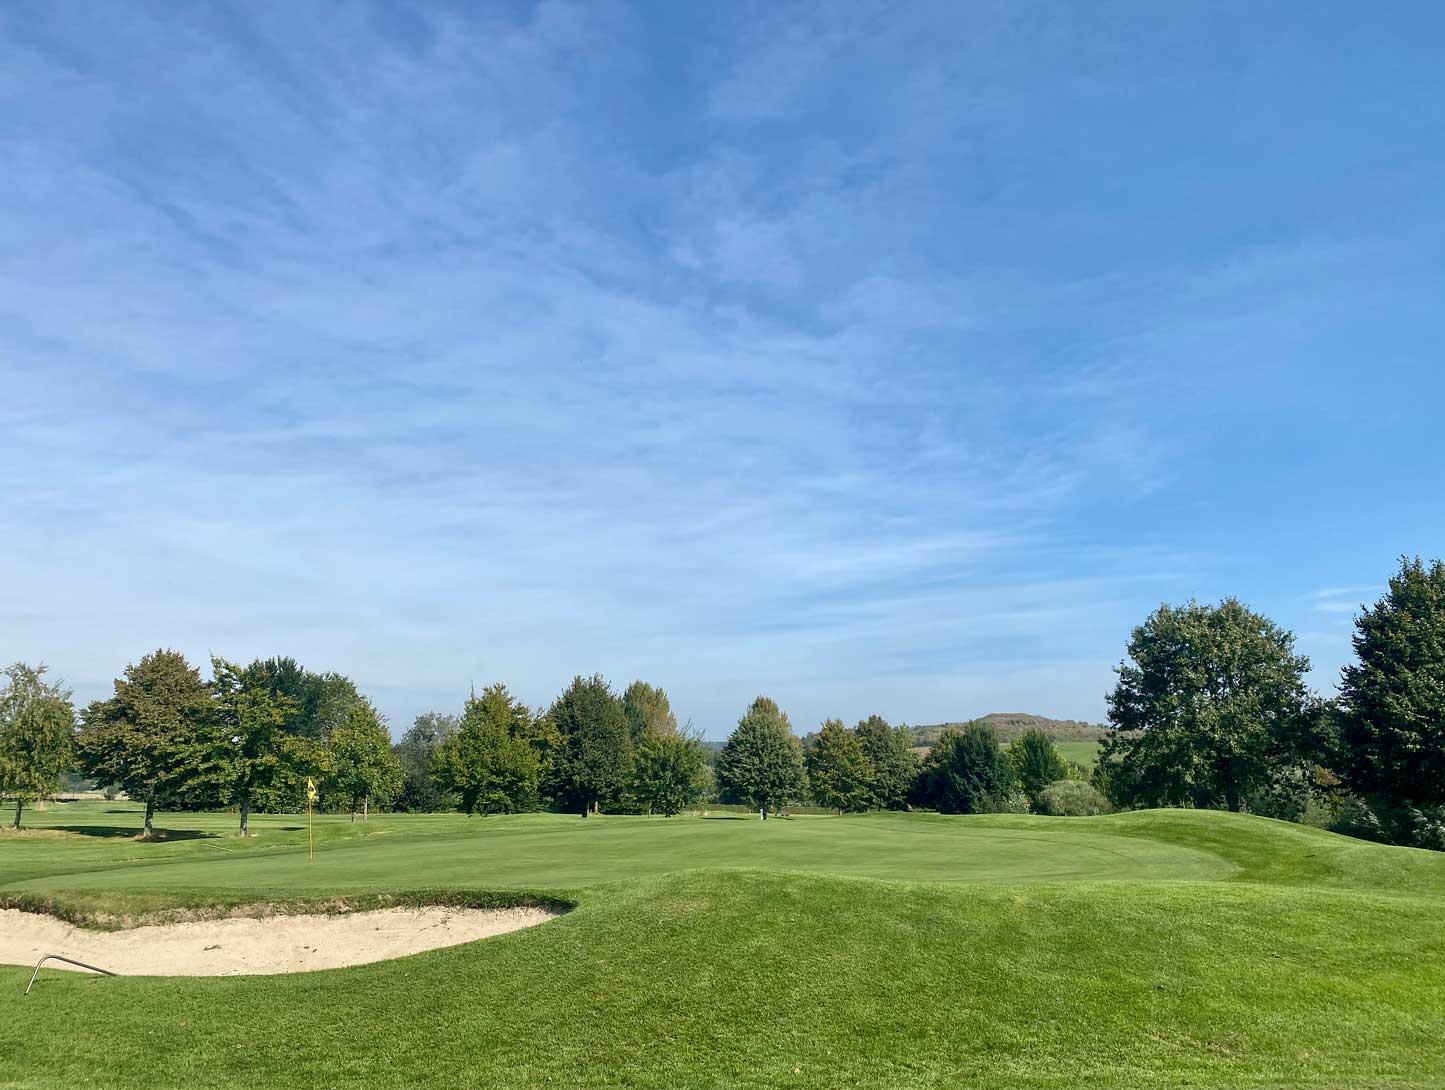 210930_cocus_Blog_Event_Golf